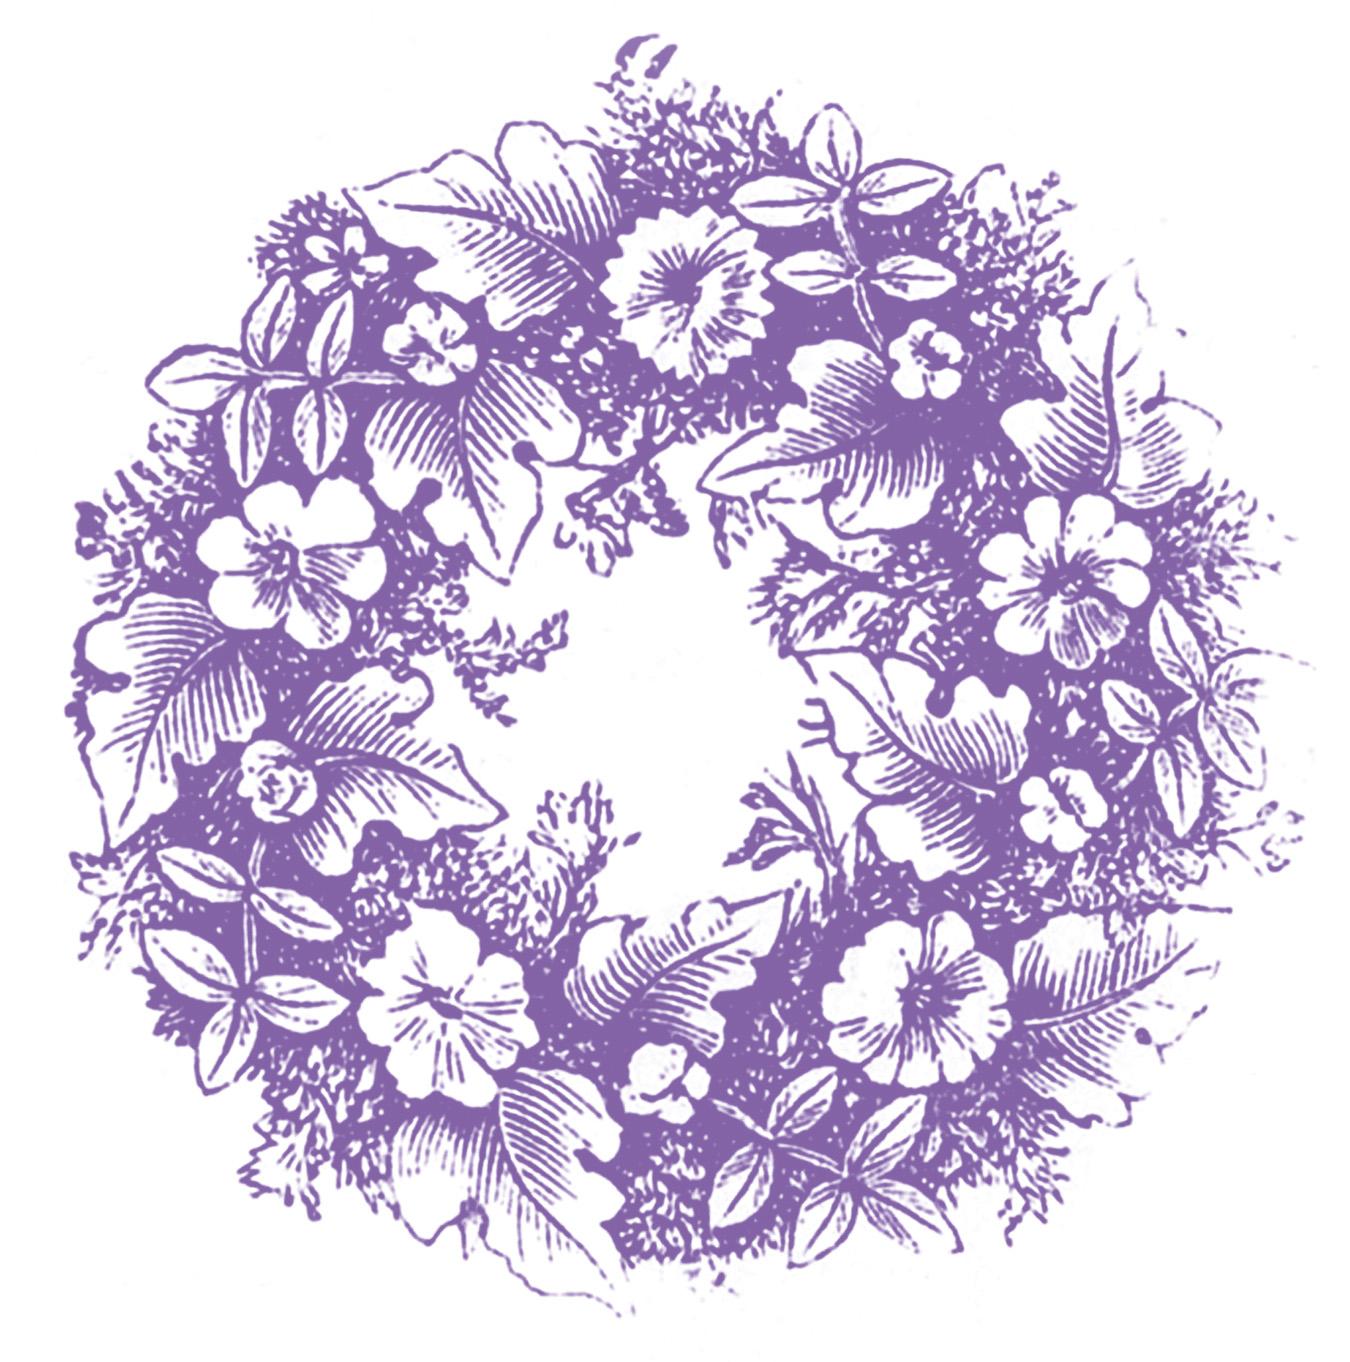 Vintage Clip Art Floral Wreaths The Graphics Fairy